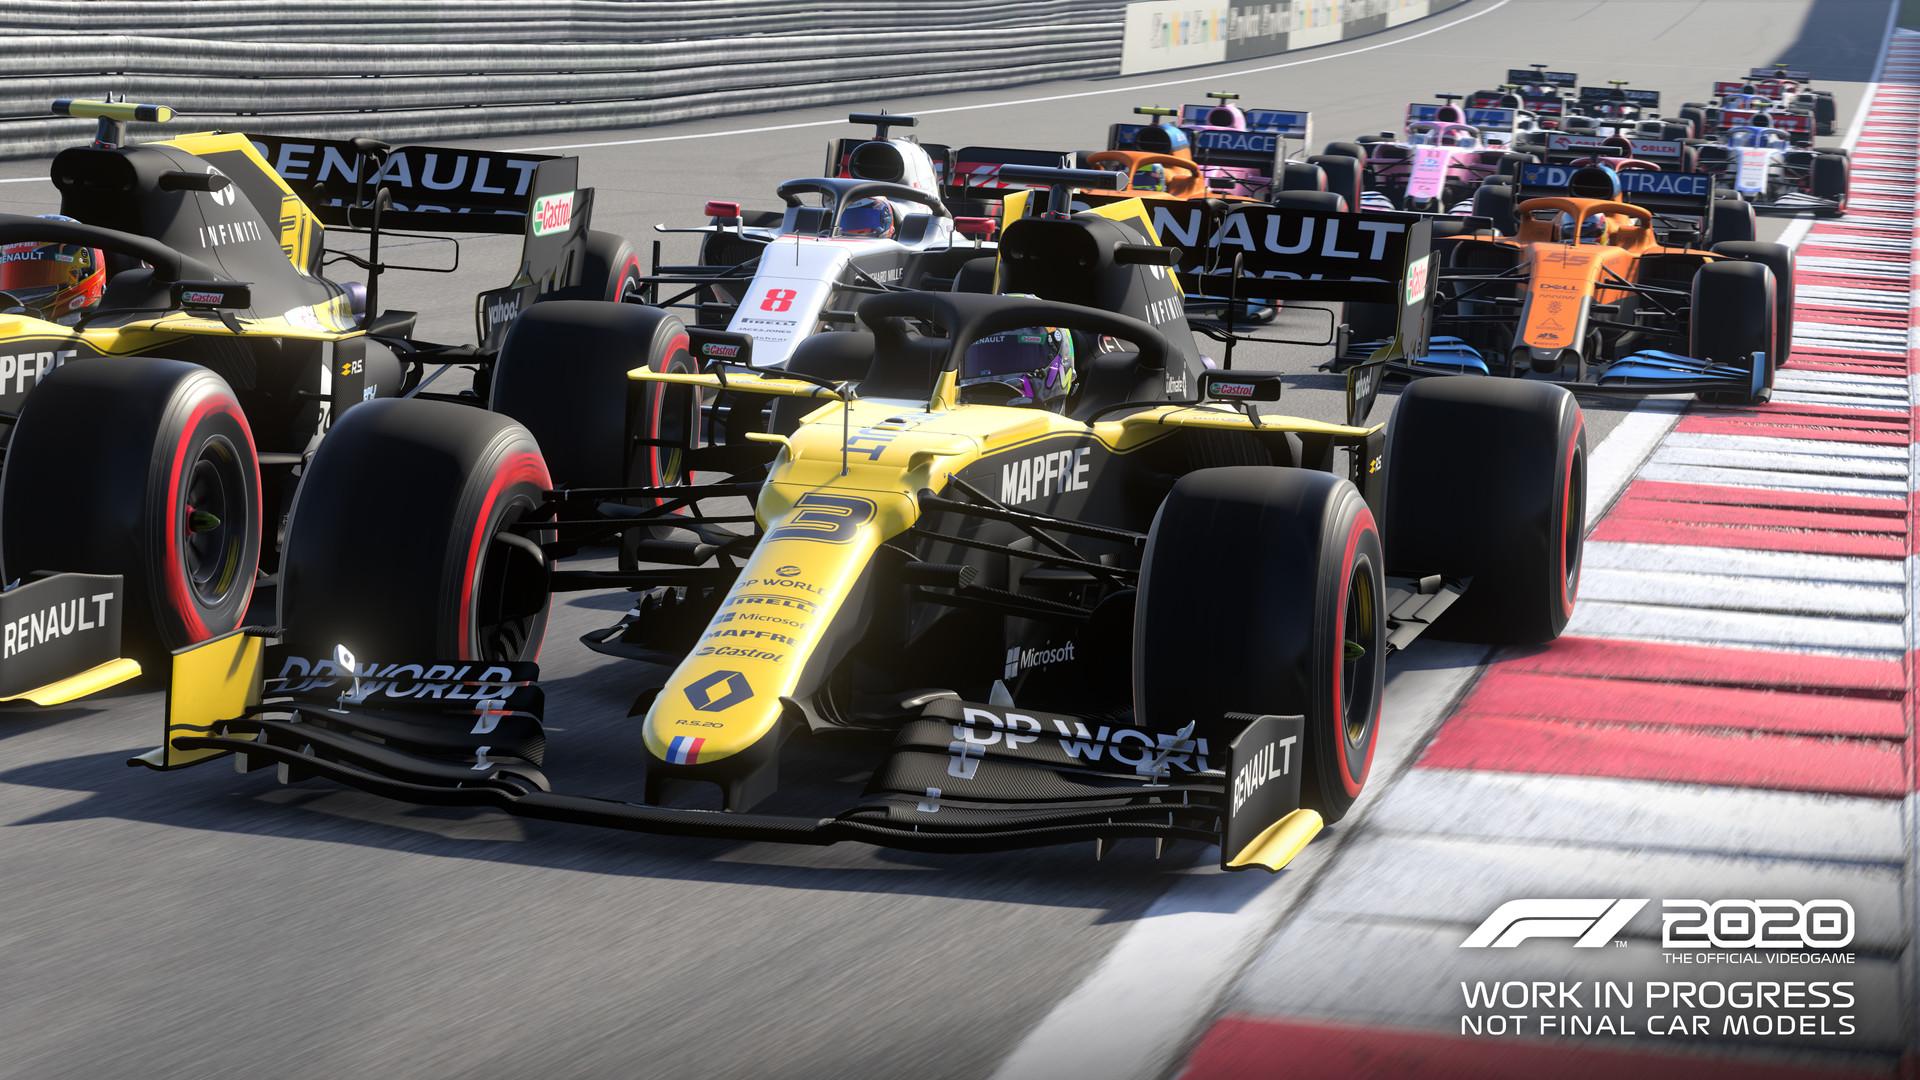 《F1 2020》摩纳哥赛道演示 极具挑战性的狭窄赛道